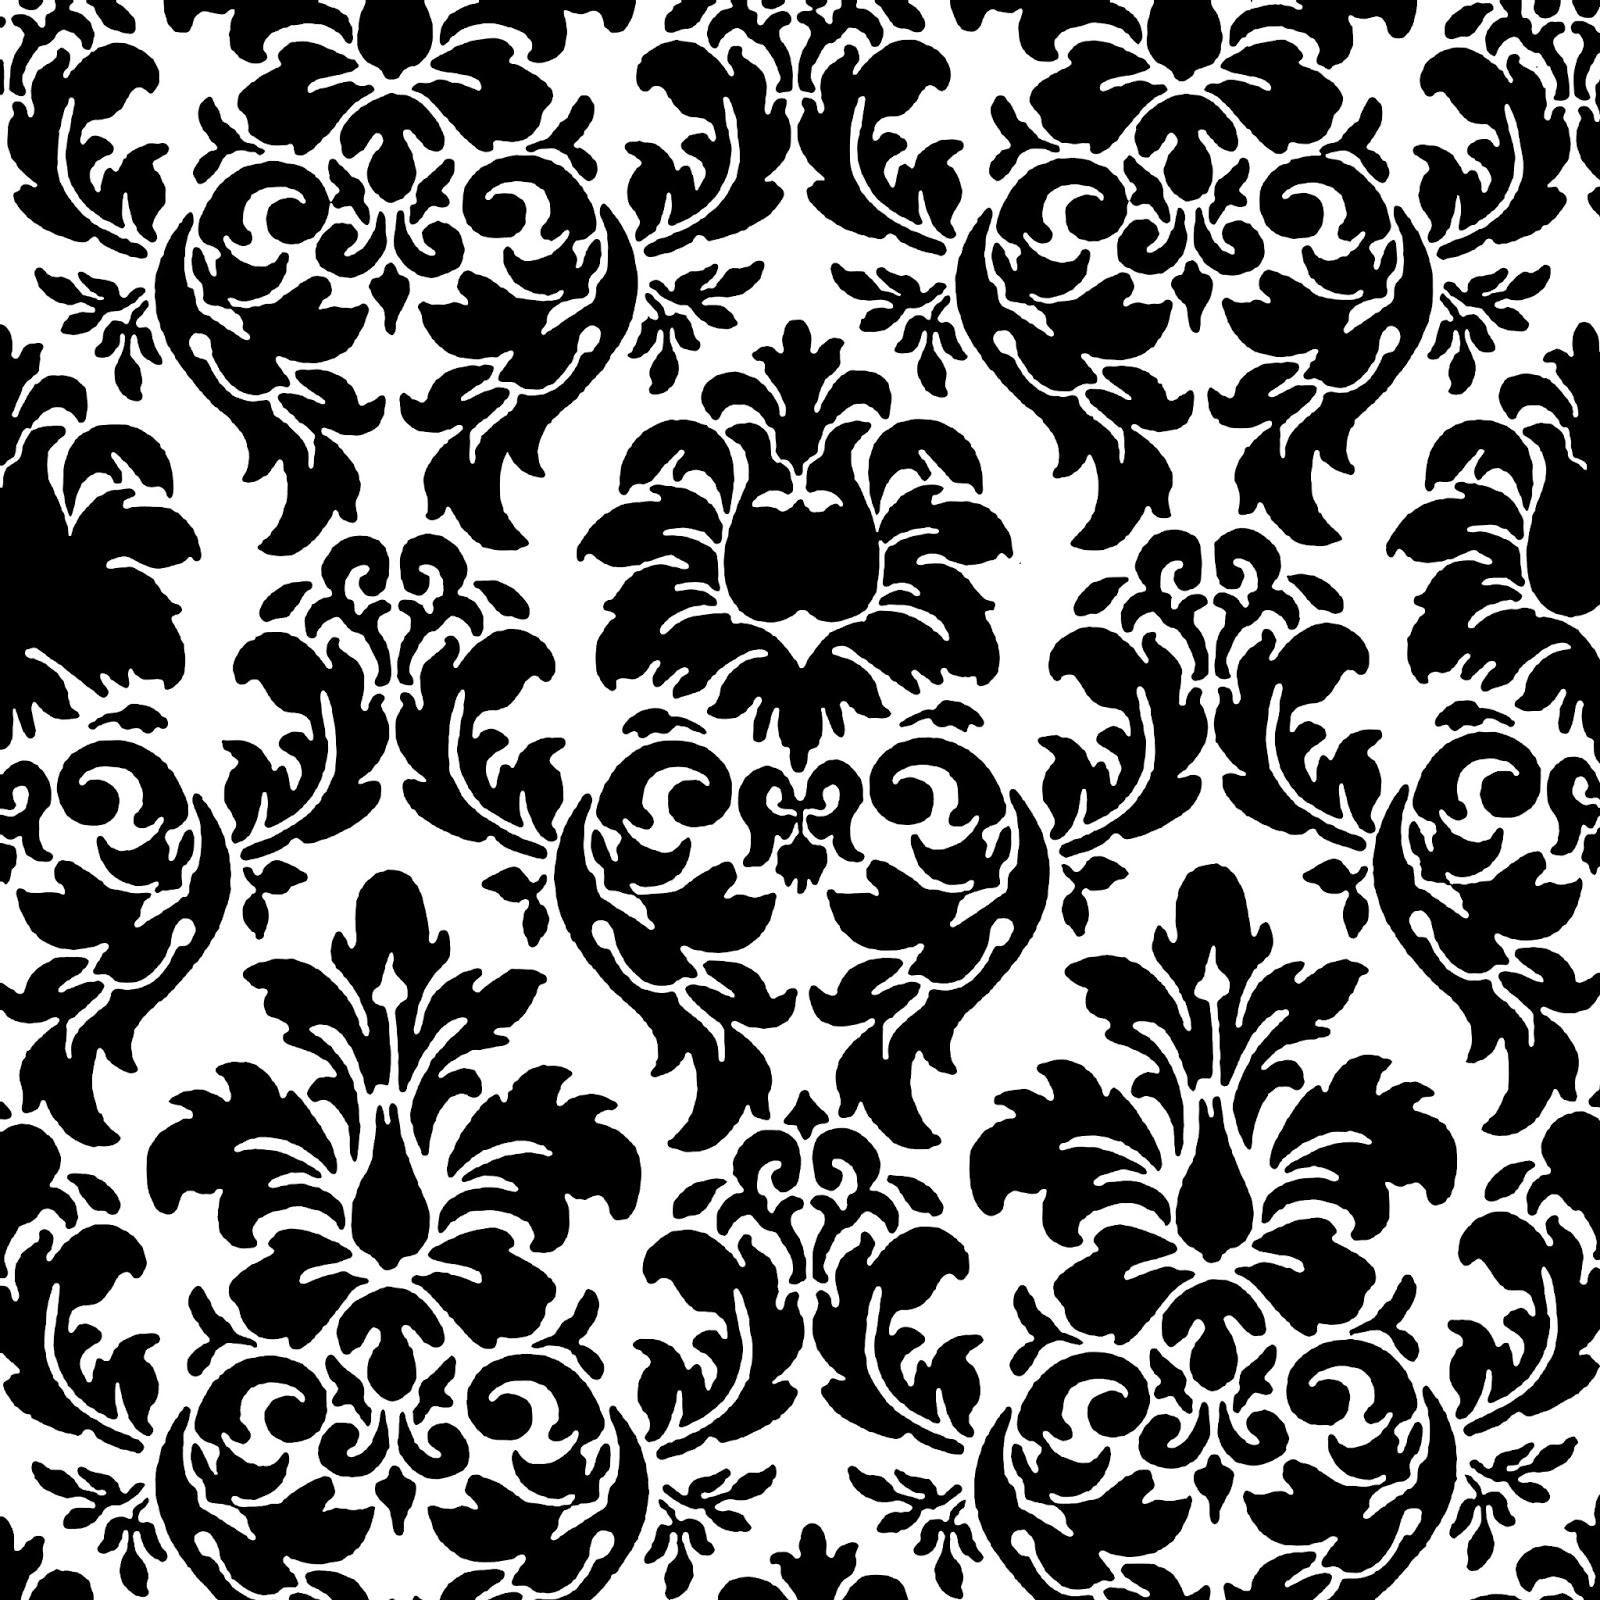 Free Black And White Damask Pattern, Download Free Clip Art, Free.